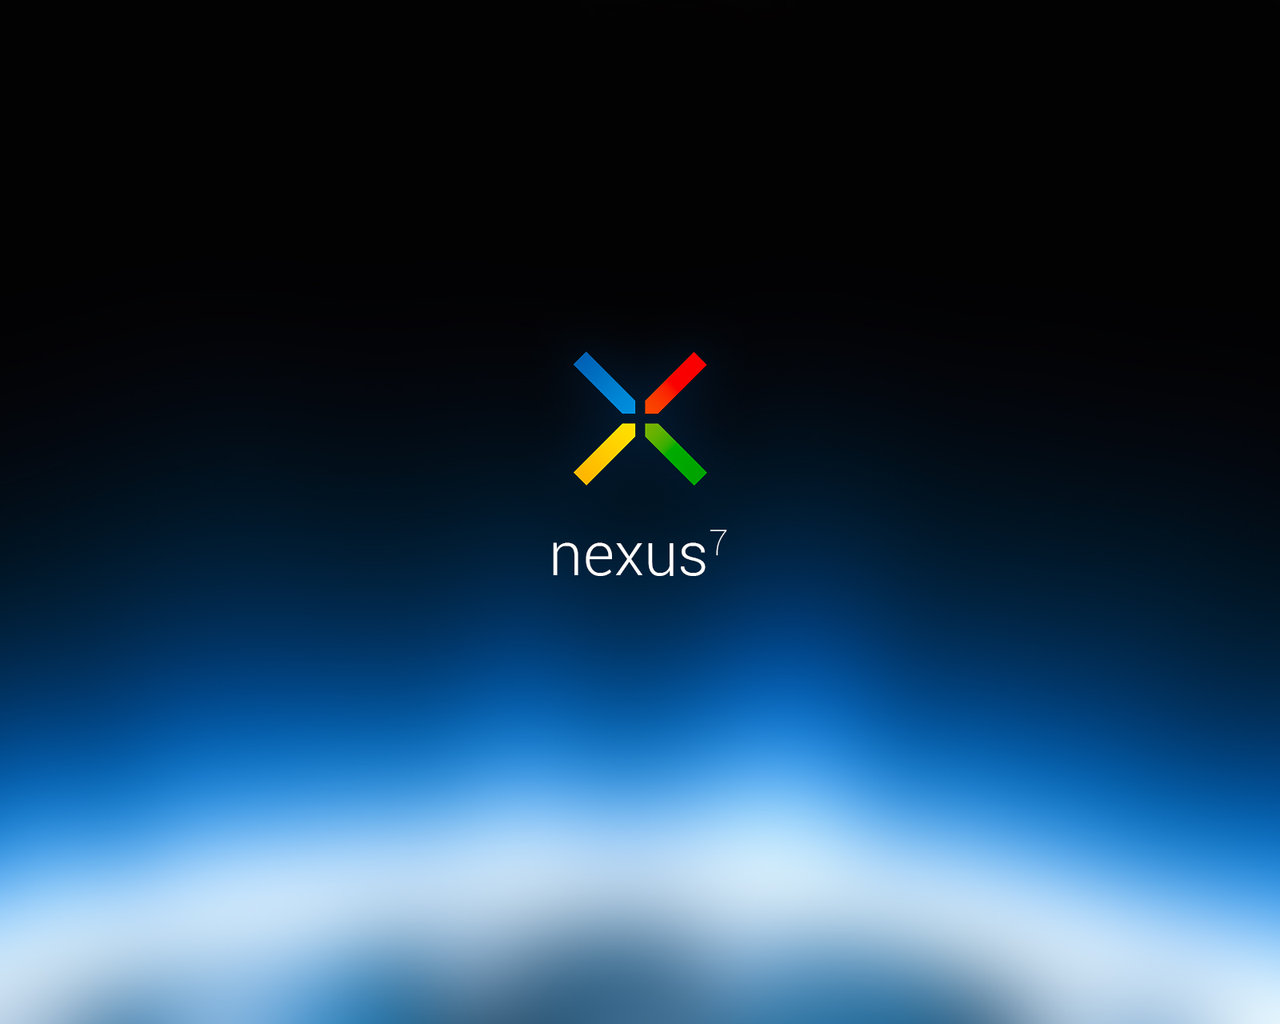 Nexus 7 Wallpaper HD   PixelsTalk.Net